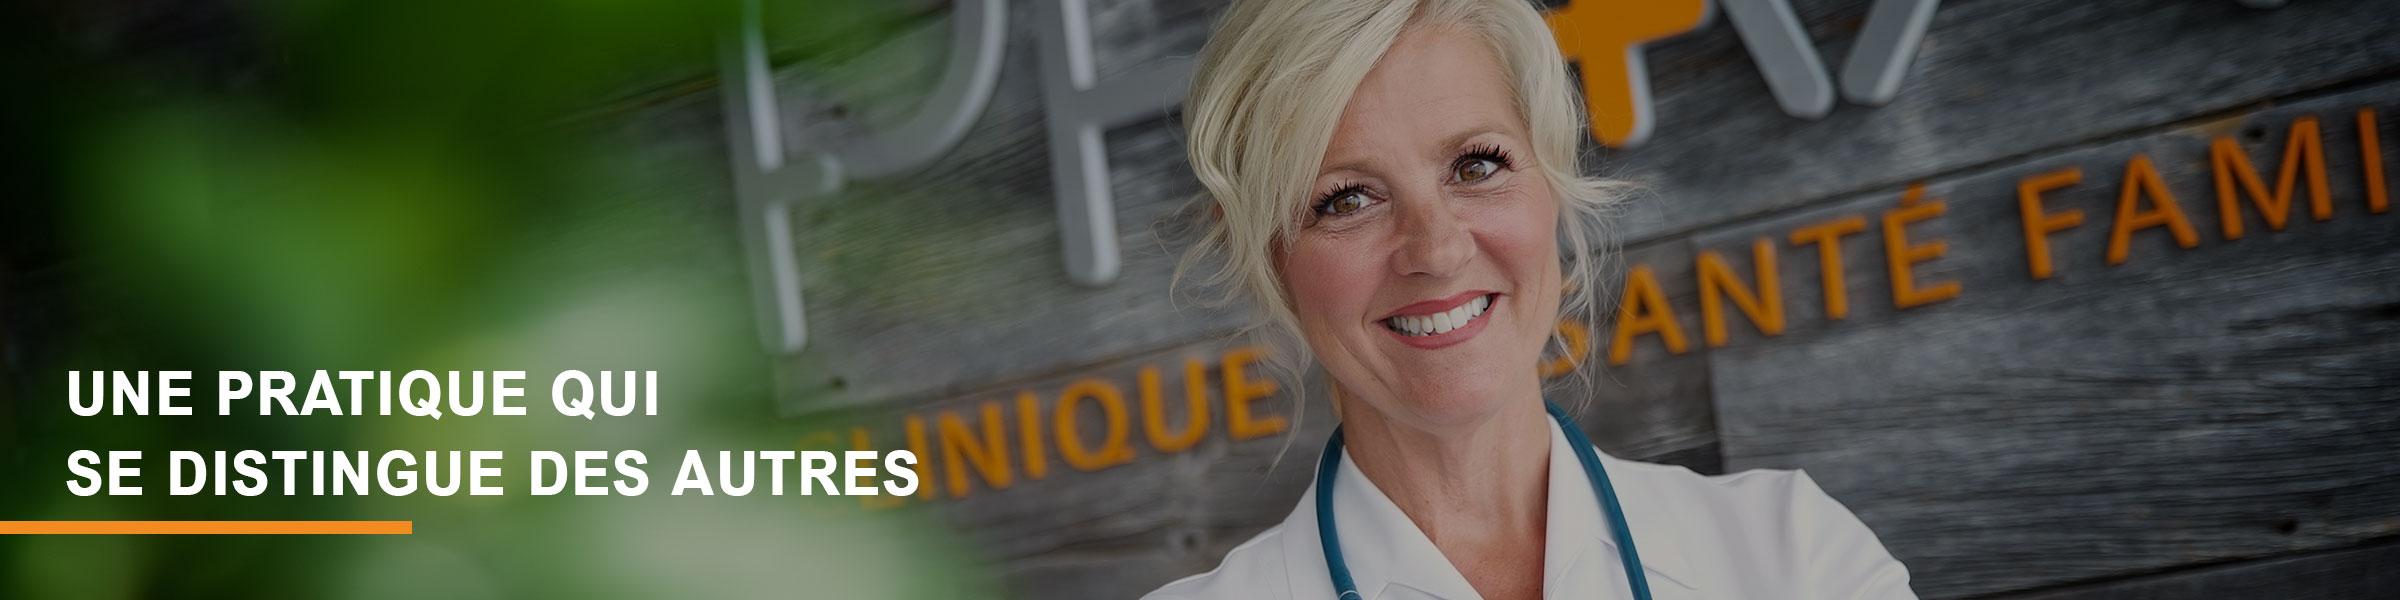 https://cliniquepraxis.ca/wp-content/uploads/2020/11/infirmiere-clinique-praxis-2.jpg